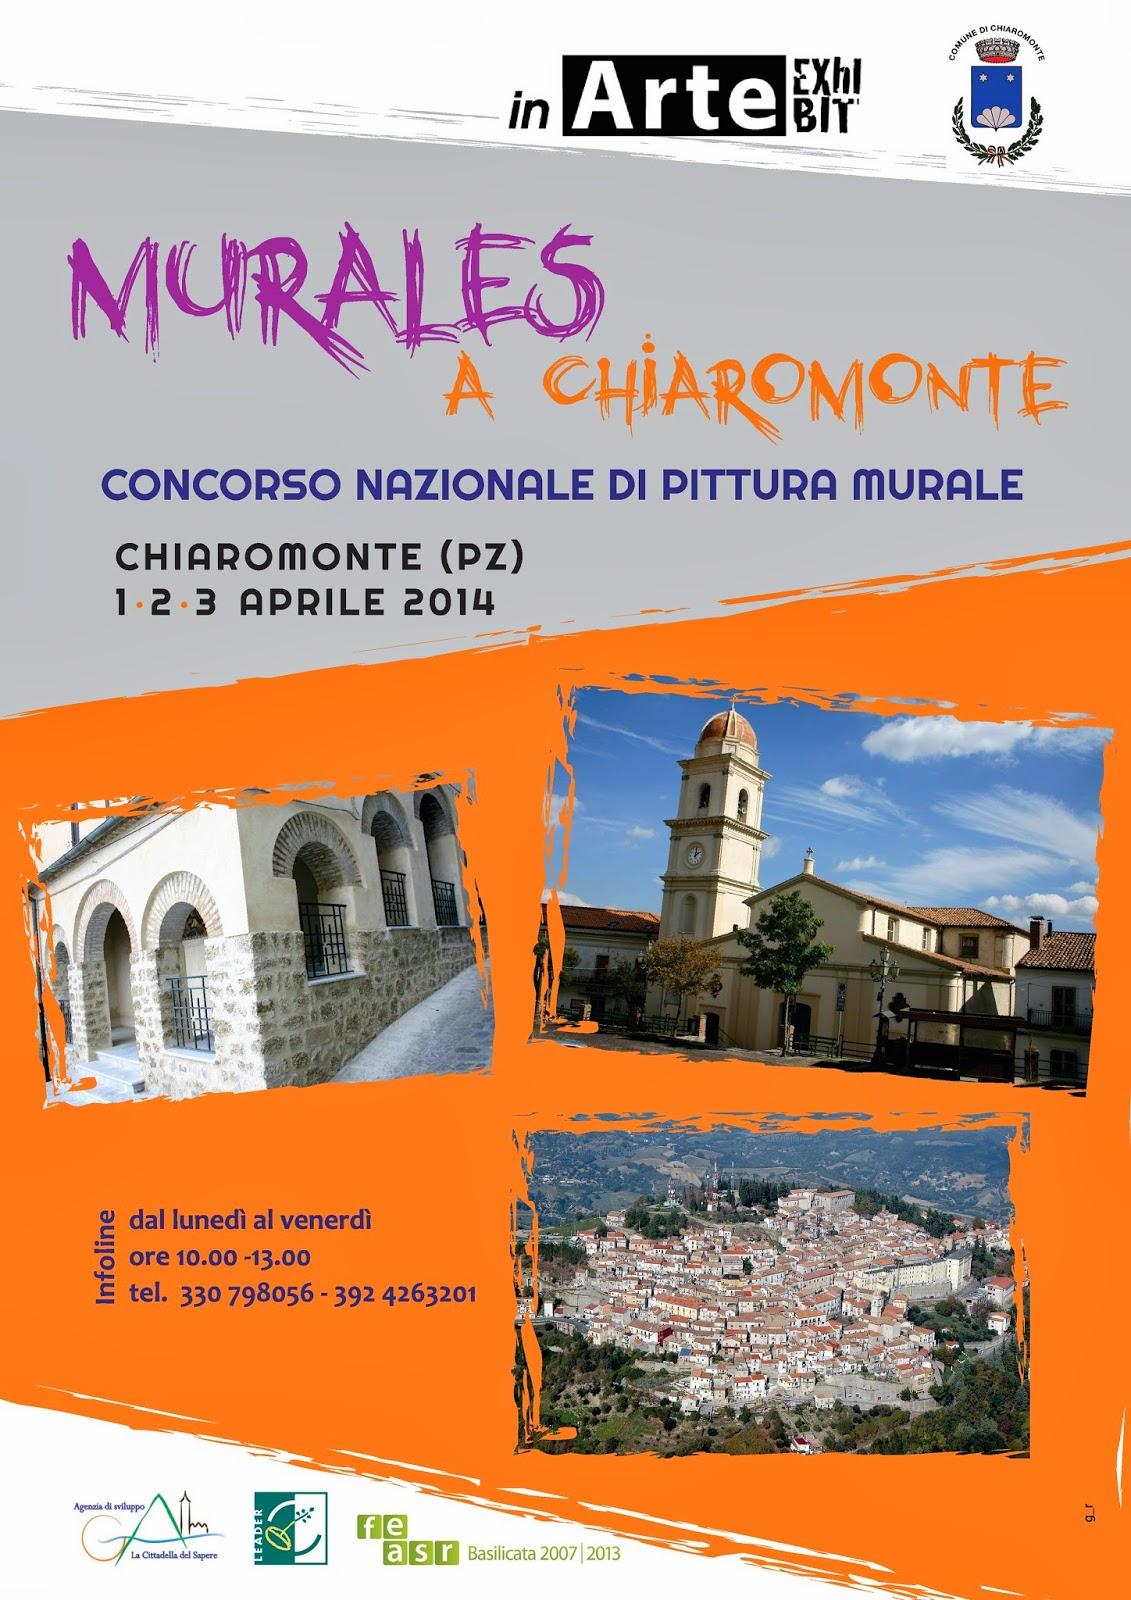 http://inarte-blog.blogspot.it/2014/03/murales-chiaromonte-antichi-mestieri.html